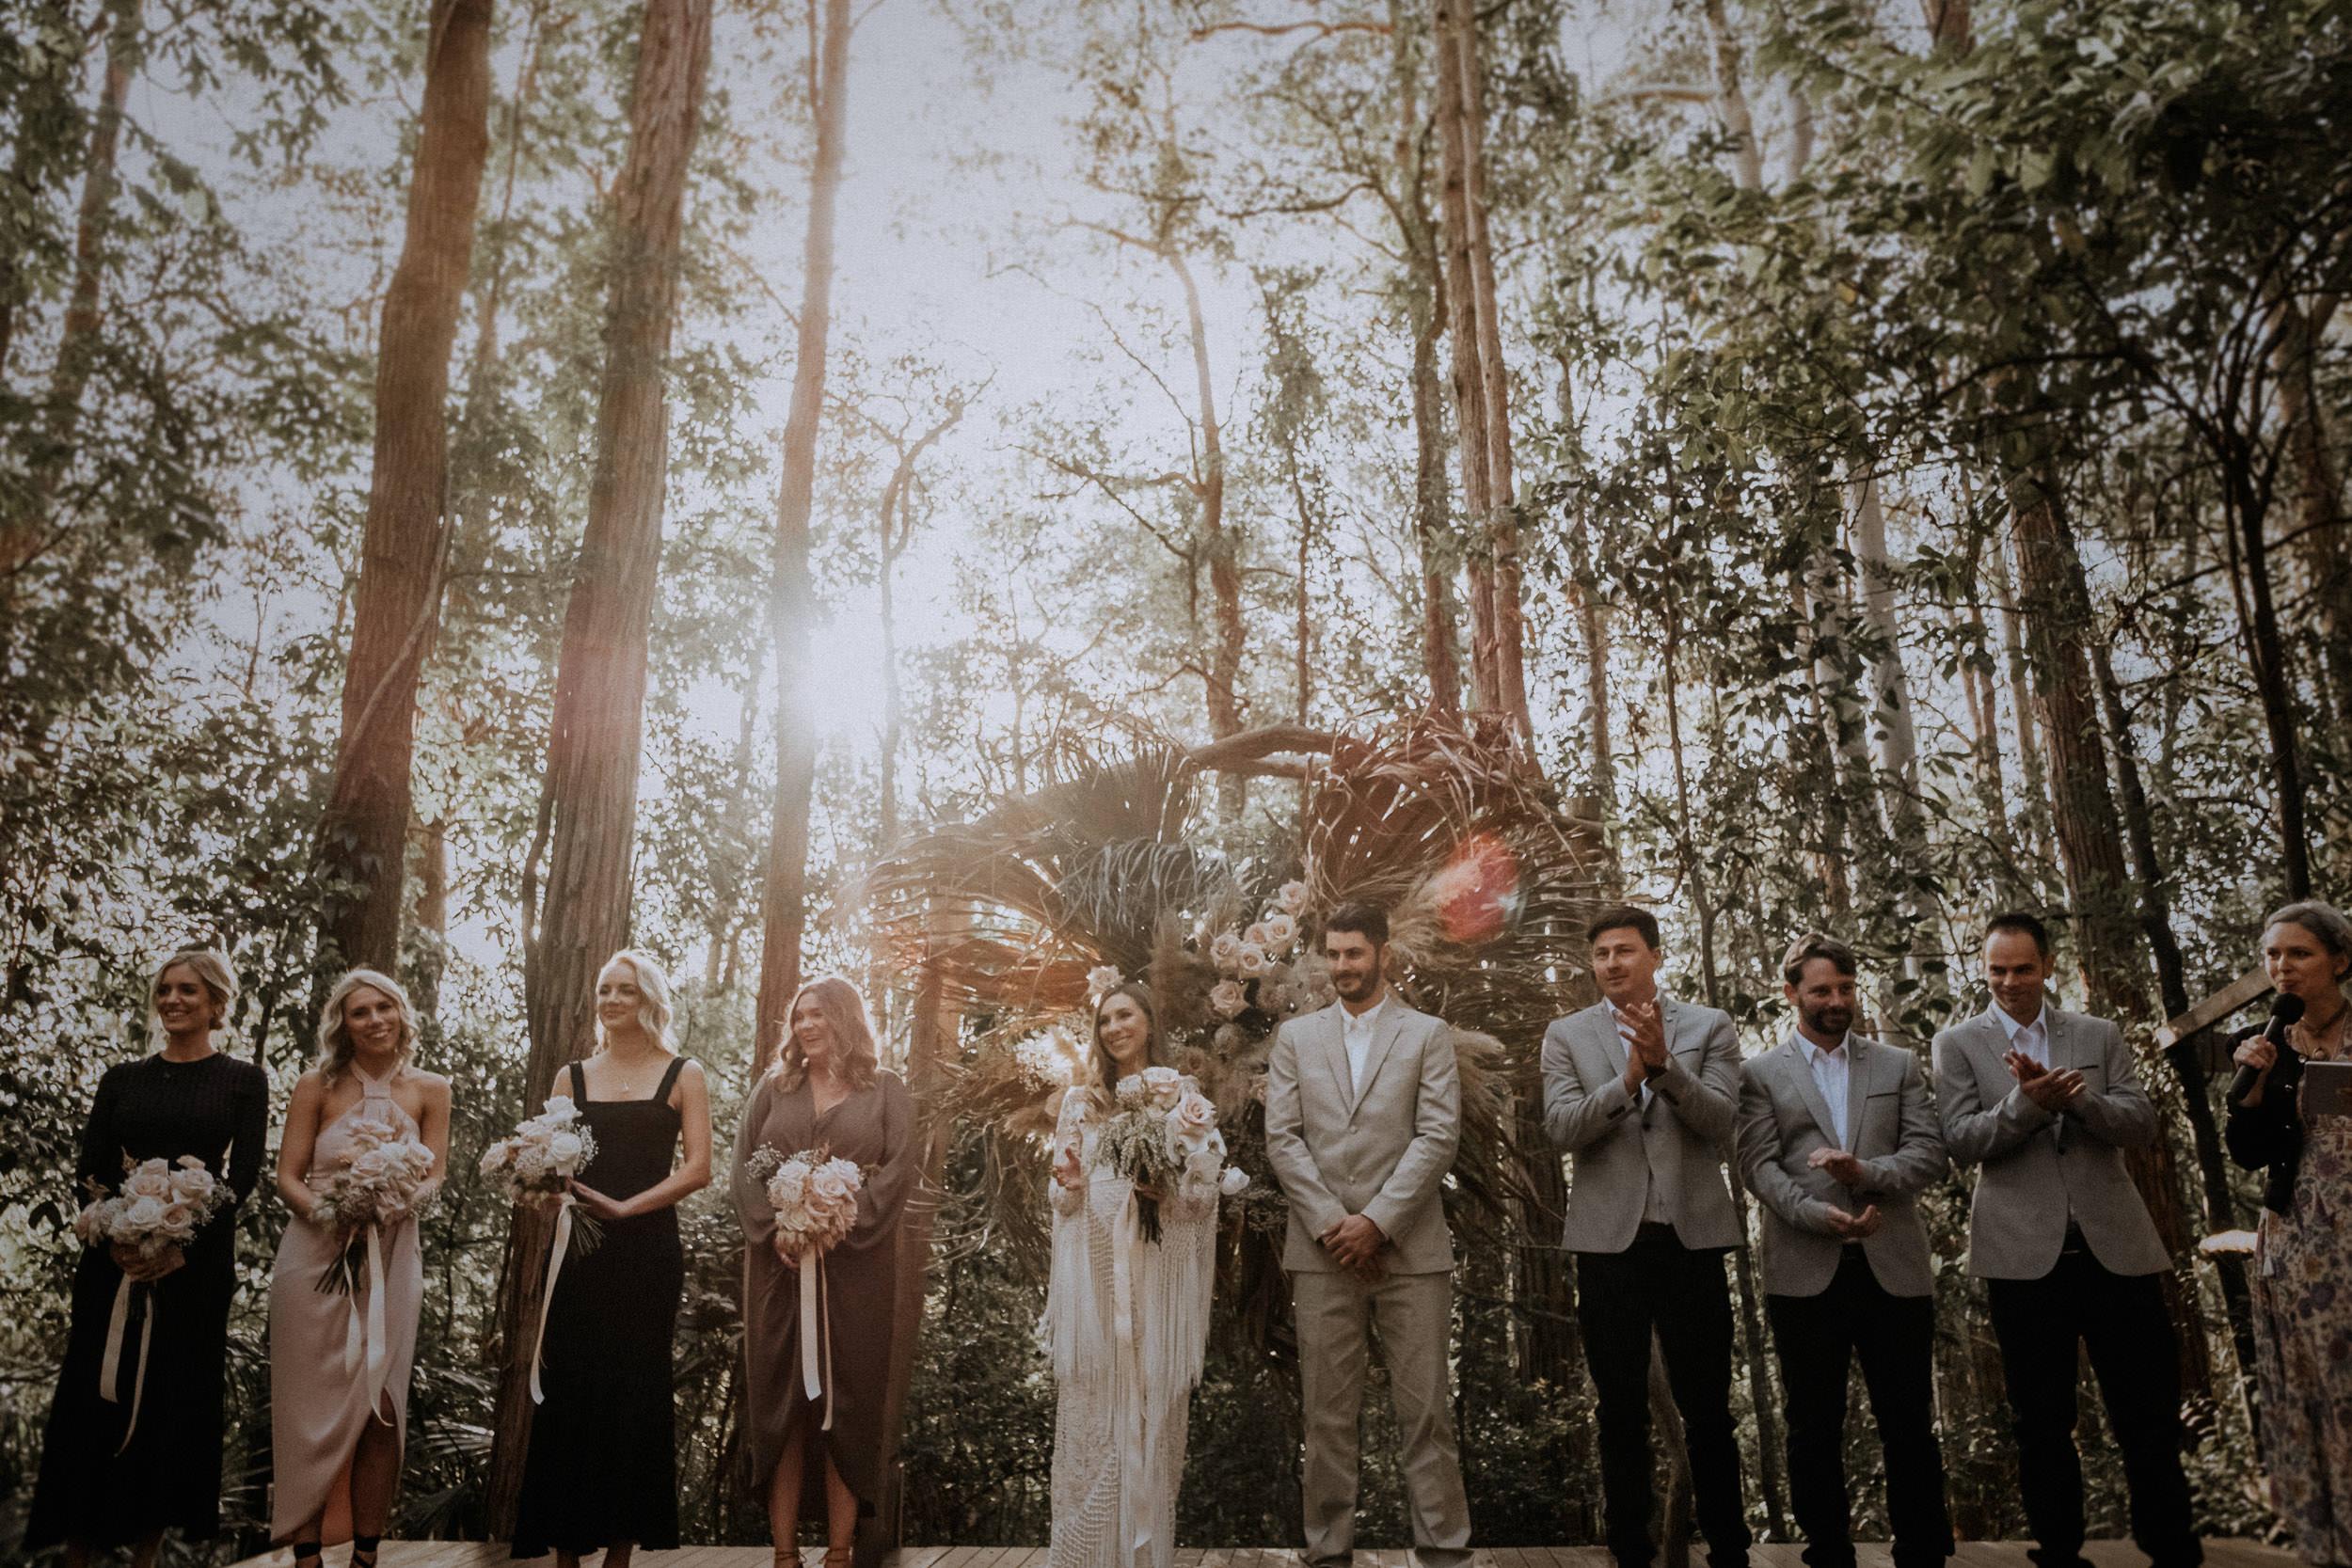 S&A Elopement - Kings & Thieves - Shred 'Til Dead - Central Coast Beach Forest Wedding - 180.jpg